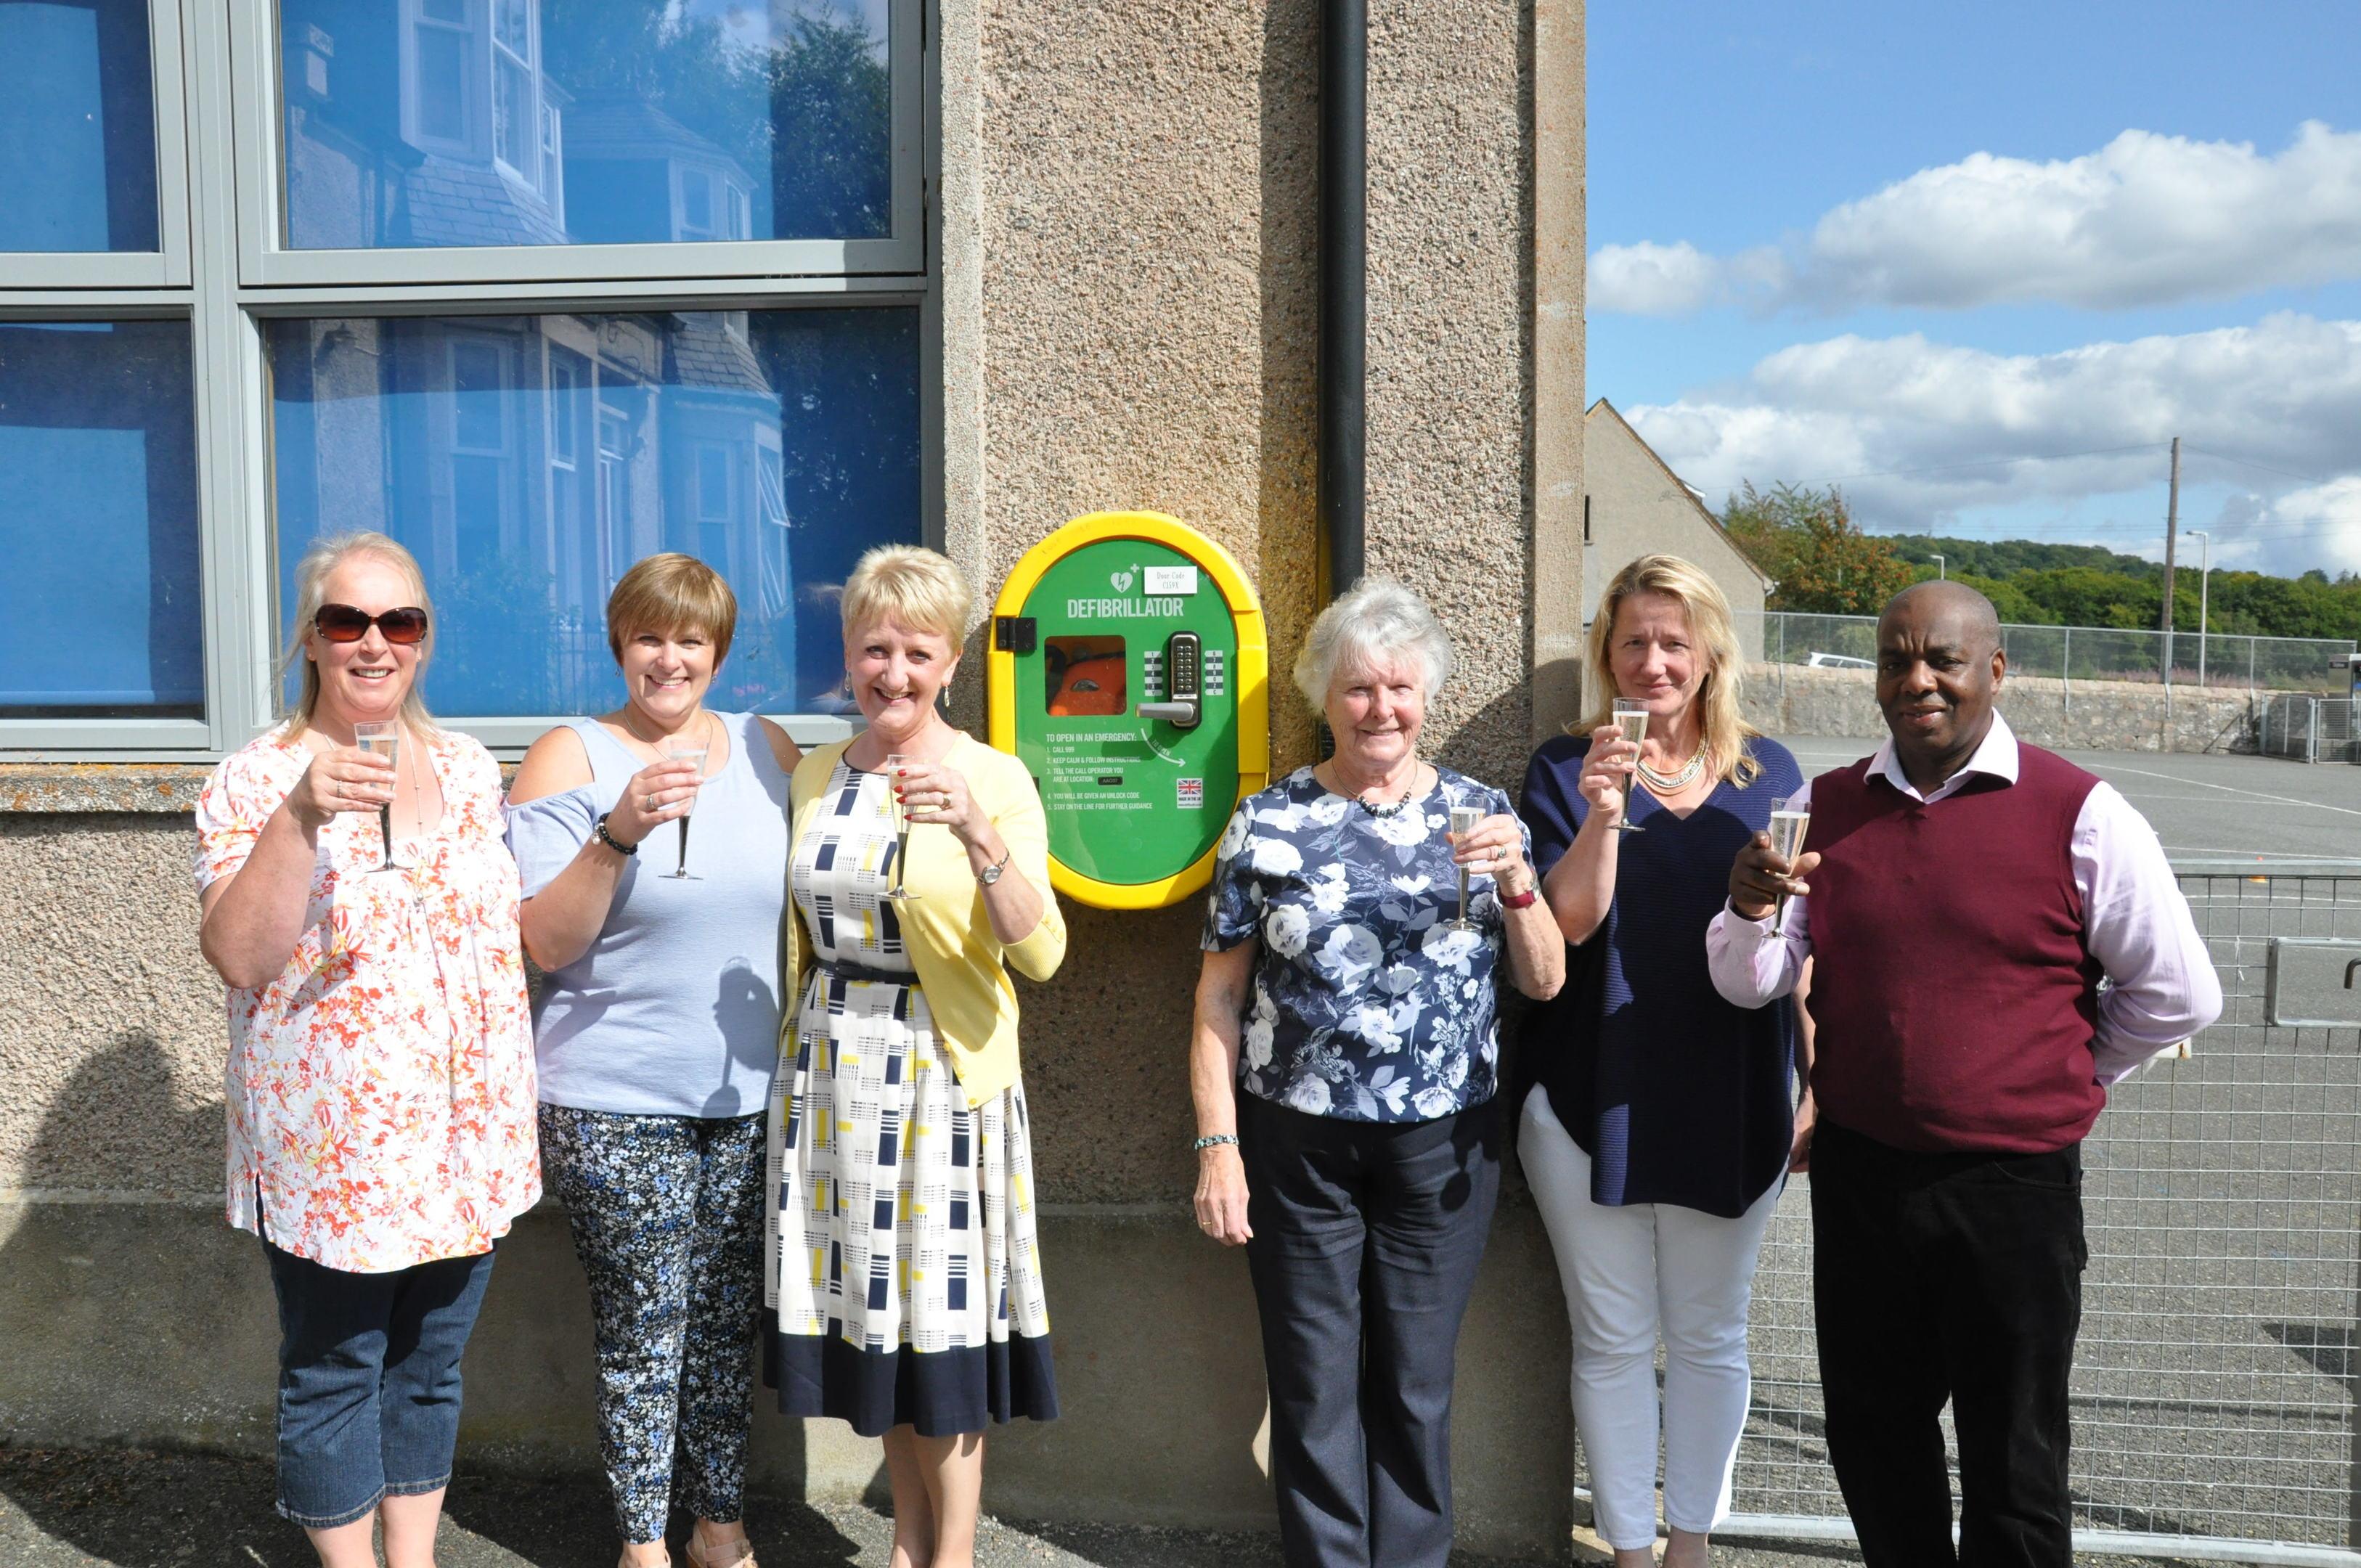 The Keig defibrillator group toast the new addition - (L-R) - Yvonne Buckingham, Diane Forbes, Celia Williams, Etta Kellock,                                           Rosie Marshall and Rory Williams